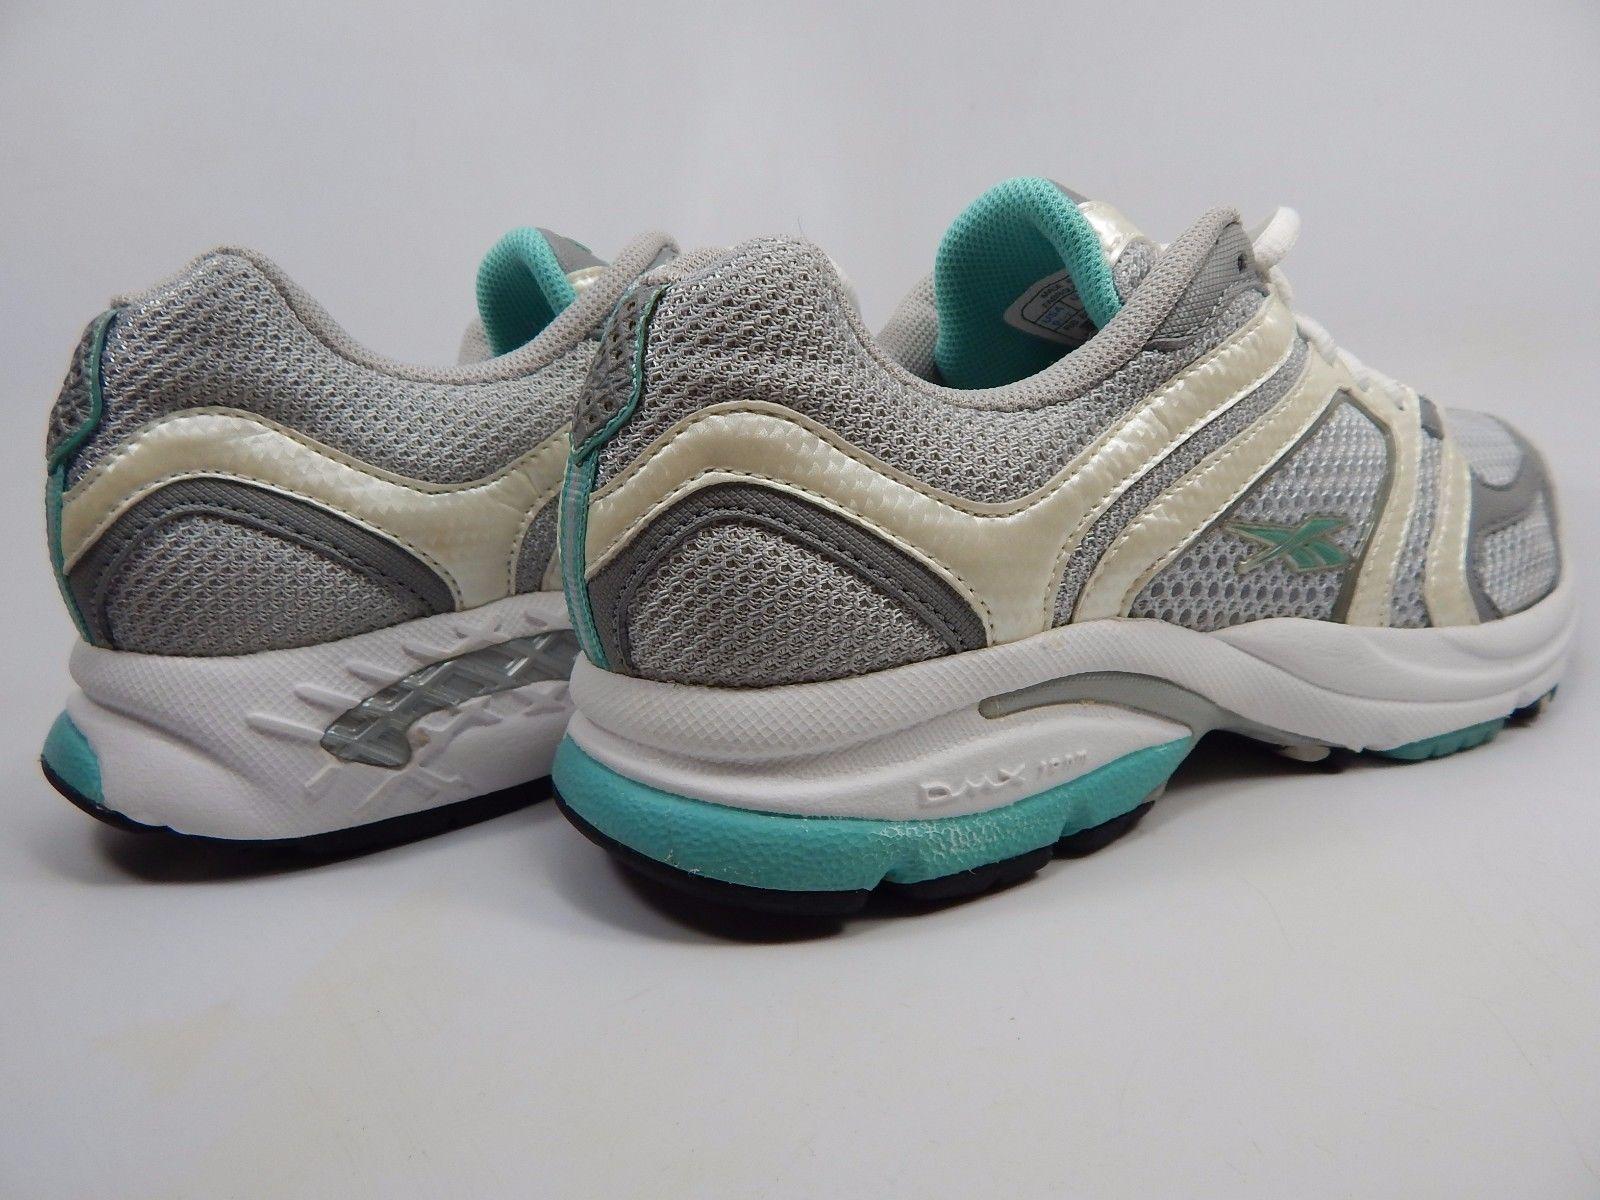 Reebok RB 804 FLU Women's Running Shoes Size US 9.5 M (B) EU 40.5 Silver Green